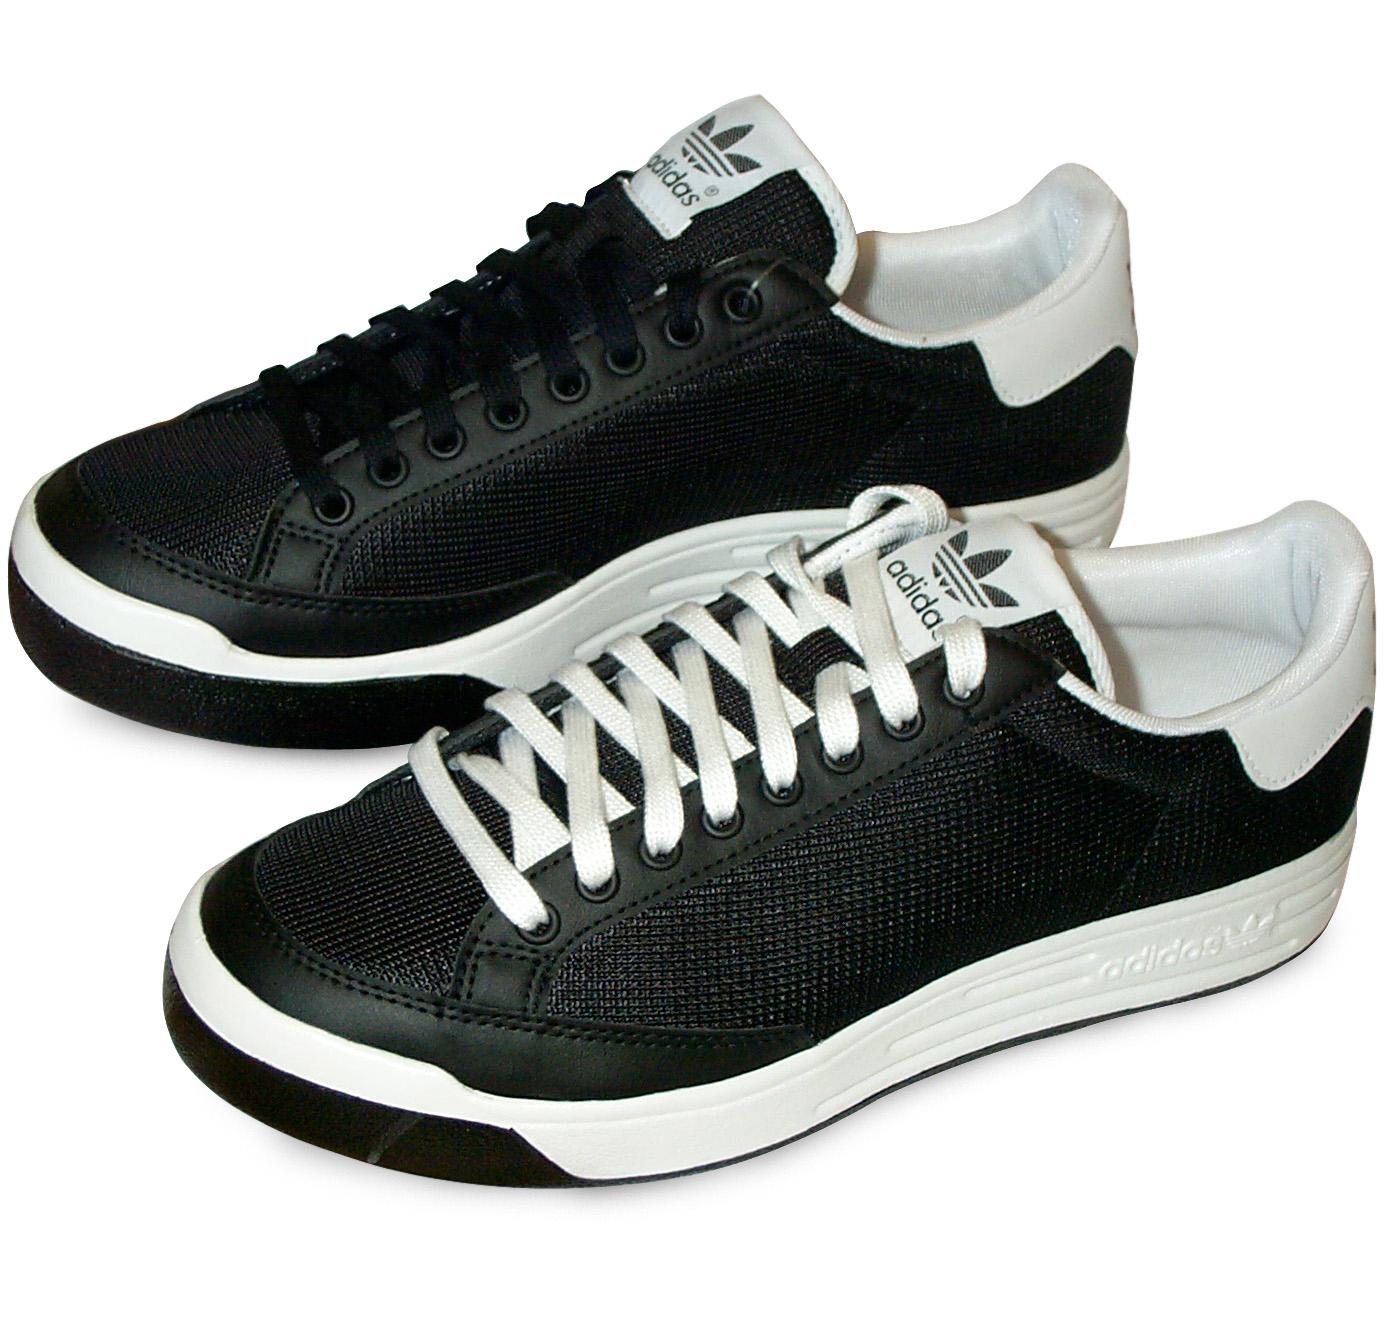 adidas rod laver tennis shoes black white world footbag